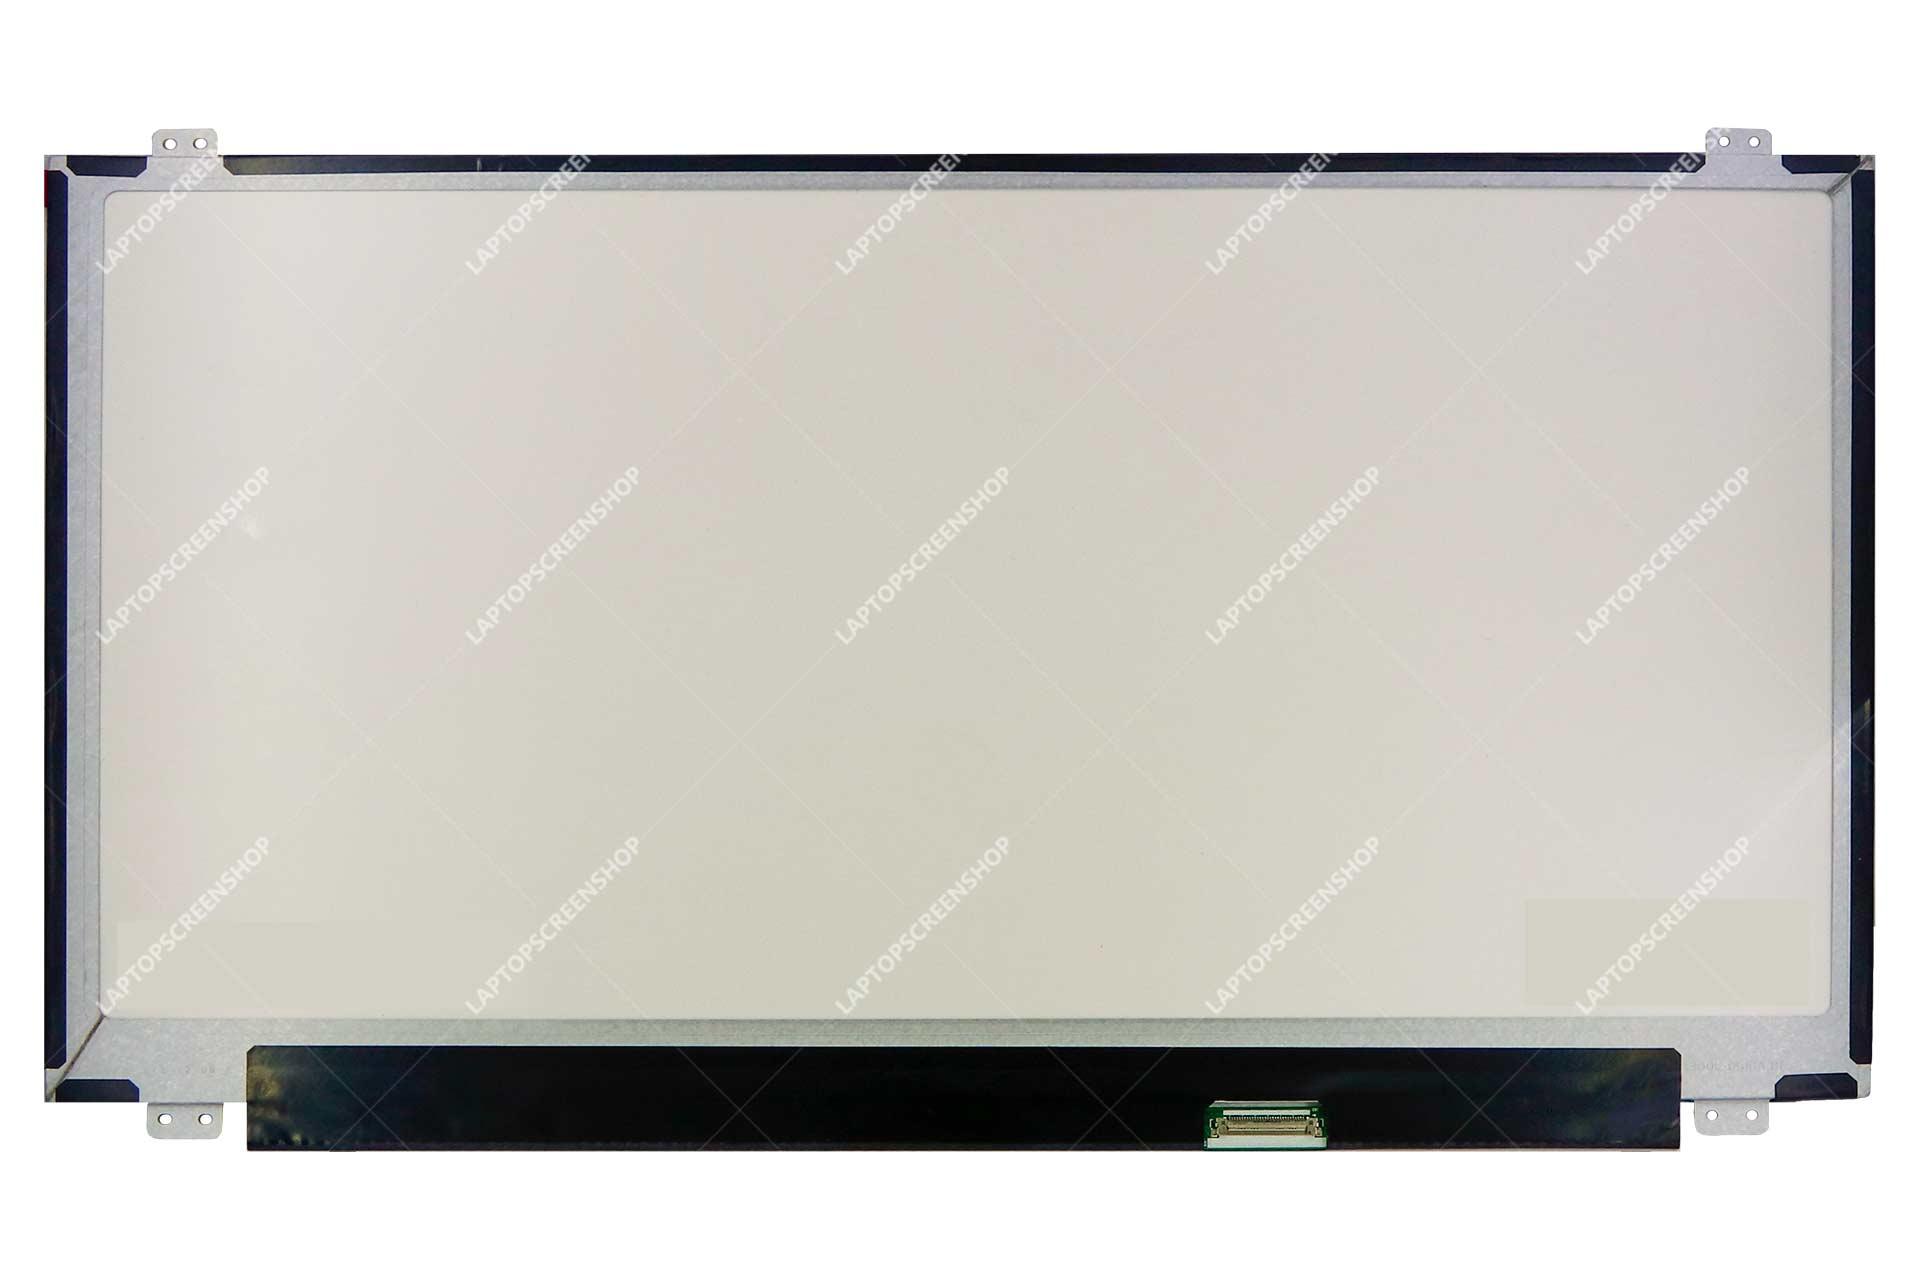 ACER-ASPIRE-E1-432-2409-LCD-LCD  HD فروشگاه لپ تاپ اسکرين   تعمير لپ تاپ